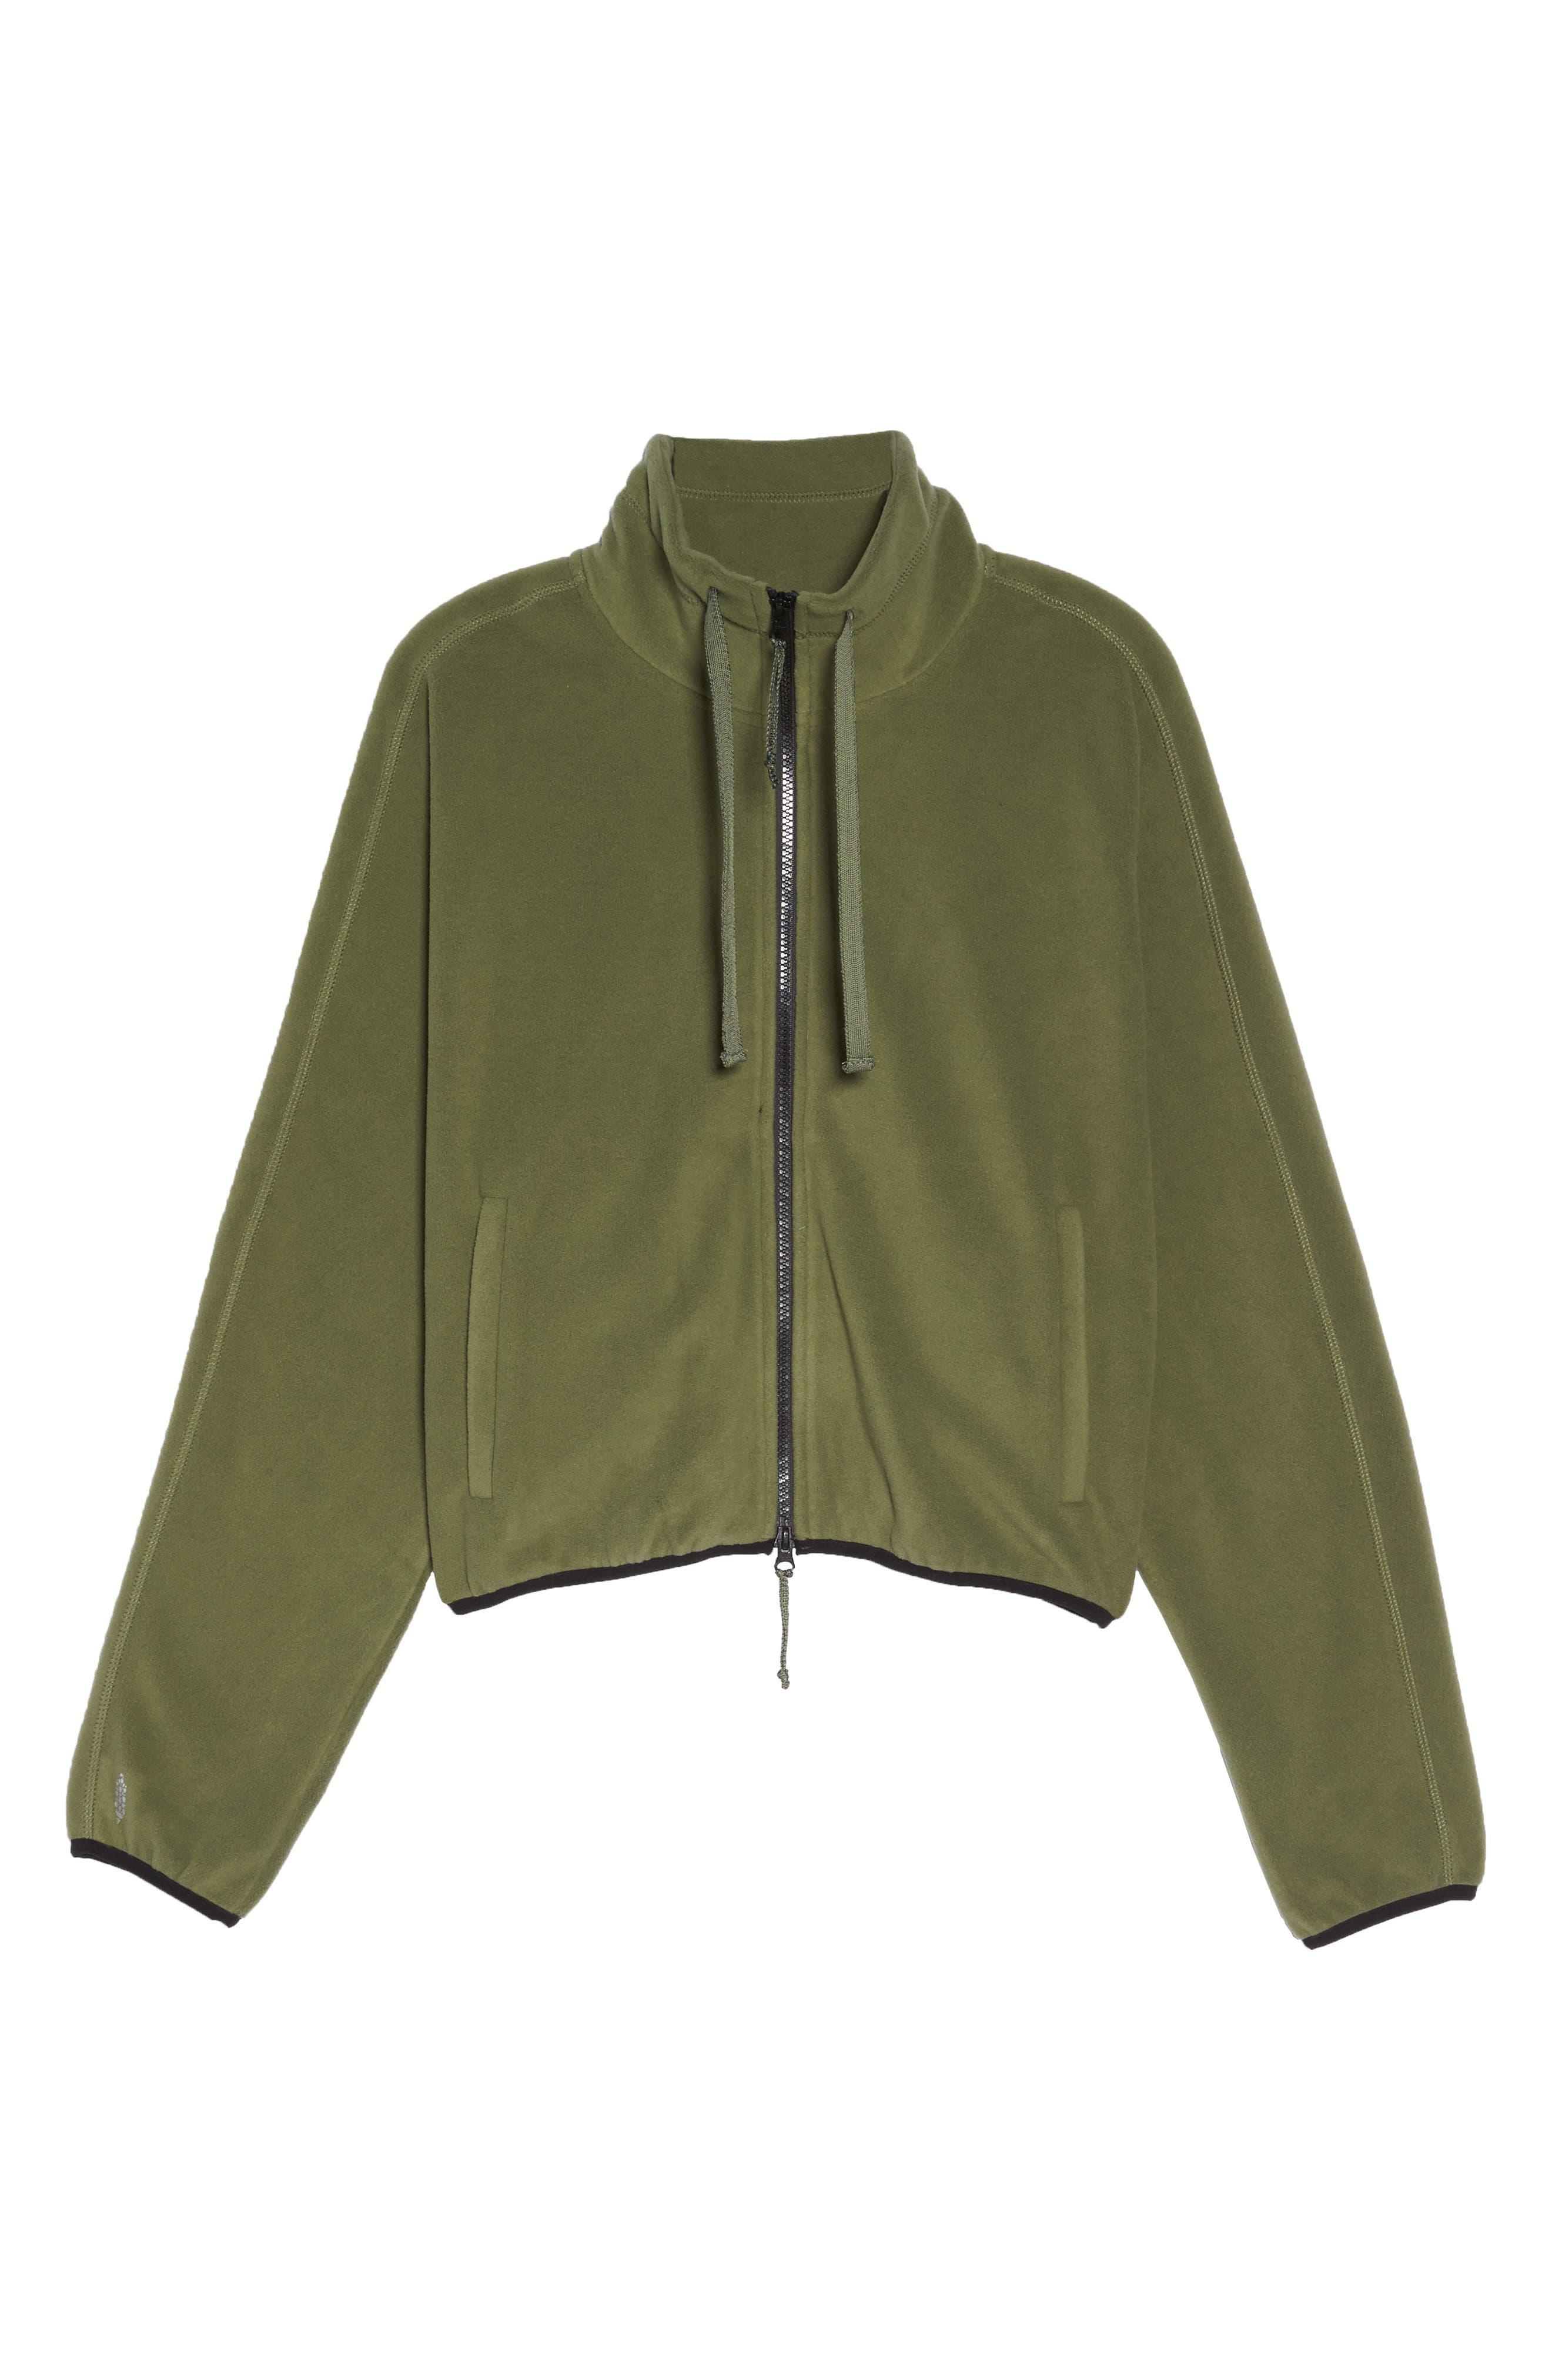 FP Movement Higher Ground Fleece Jacket,                             Alternate thumbnail 13, color,